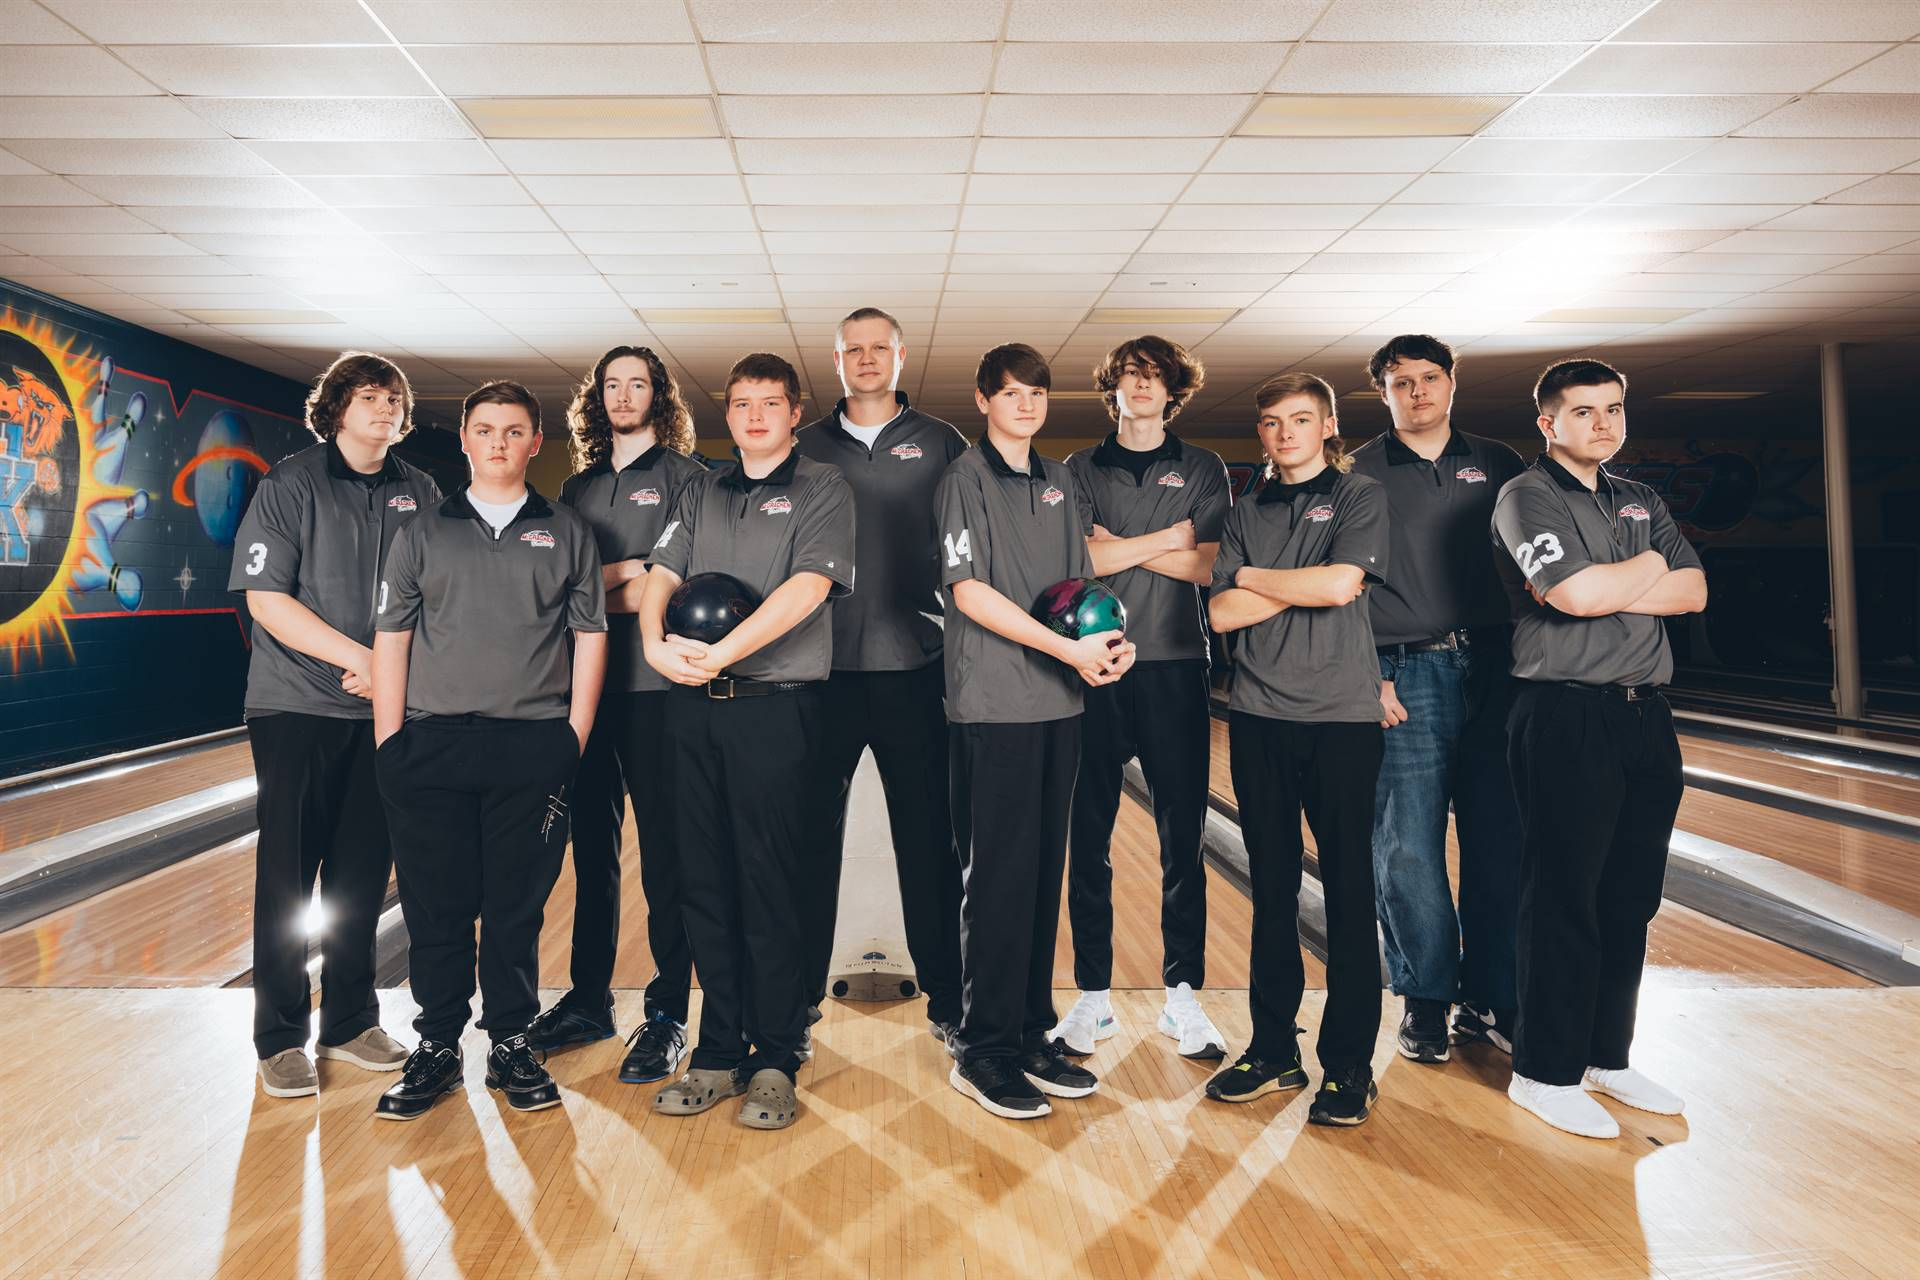 2020-21 Mustangs Men's Bowling